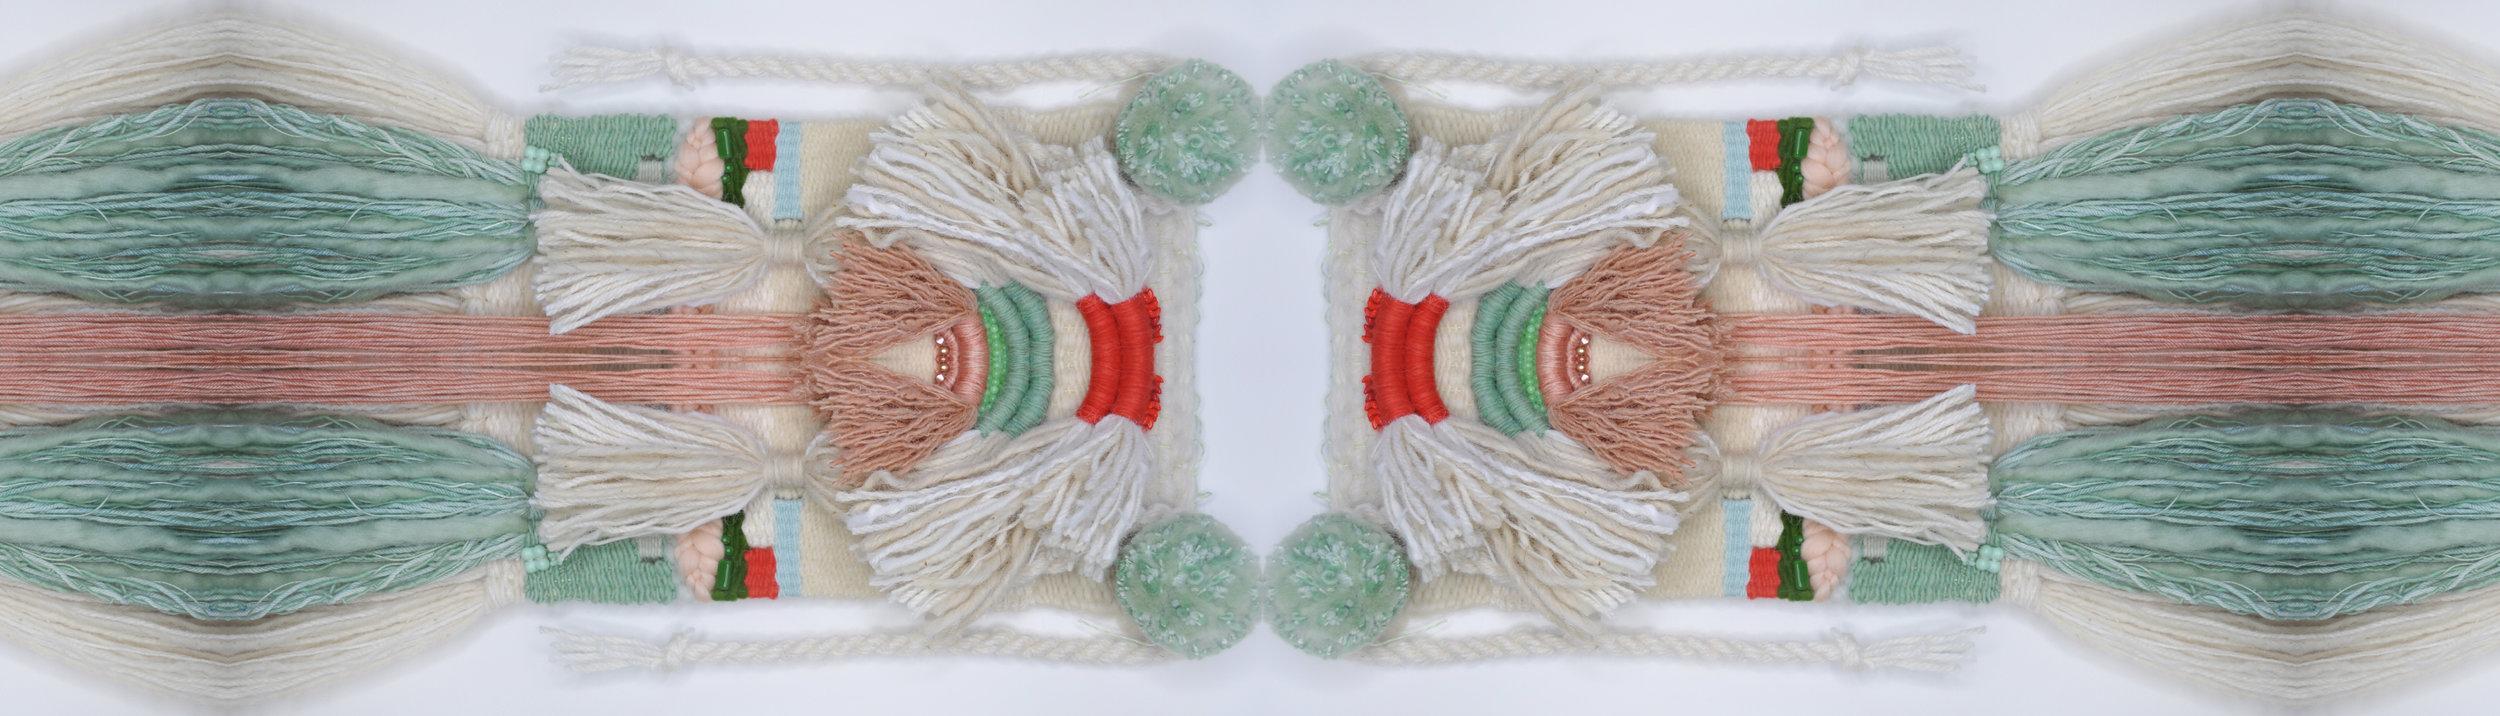 sculpural weaving banner.jpg